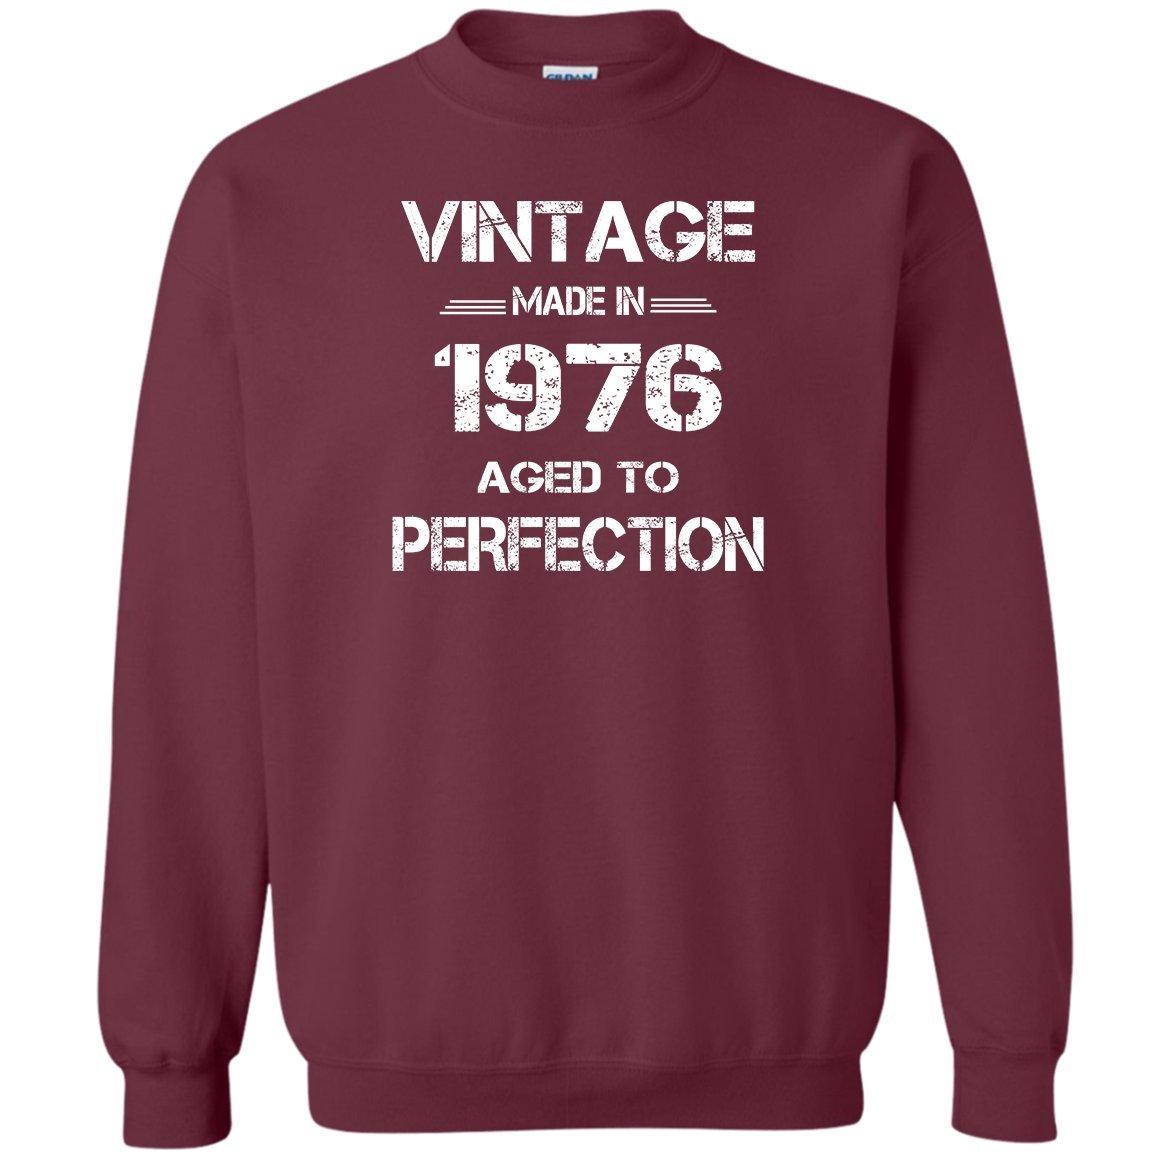 Kidoba Vintage Made In 1976 Aged To Perfect Shirt 1976 Vintage Sweatshirt